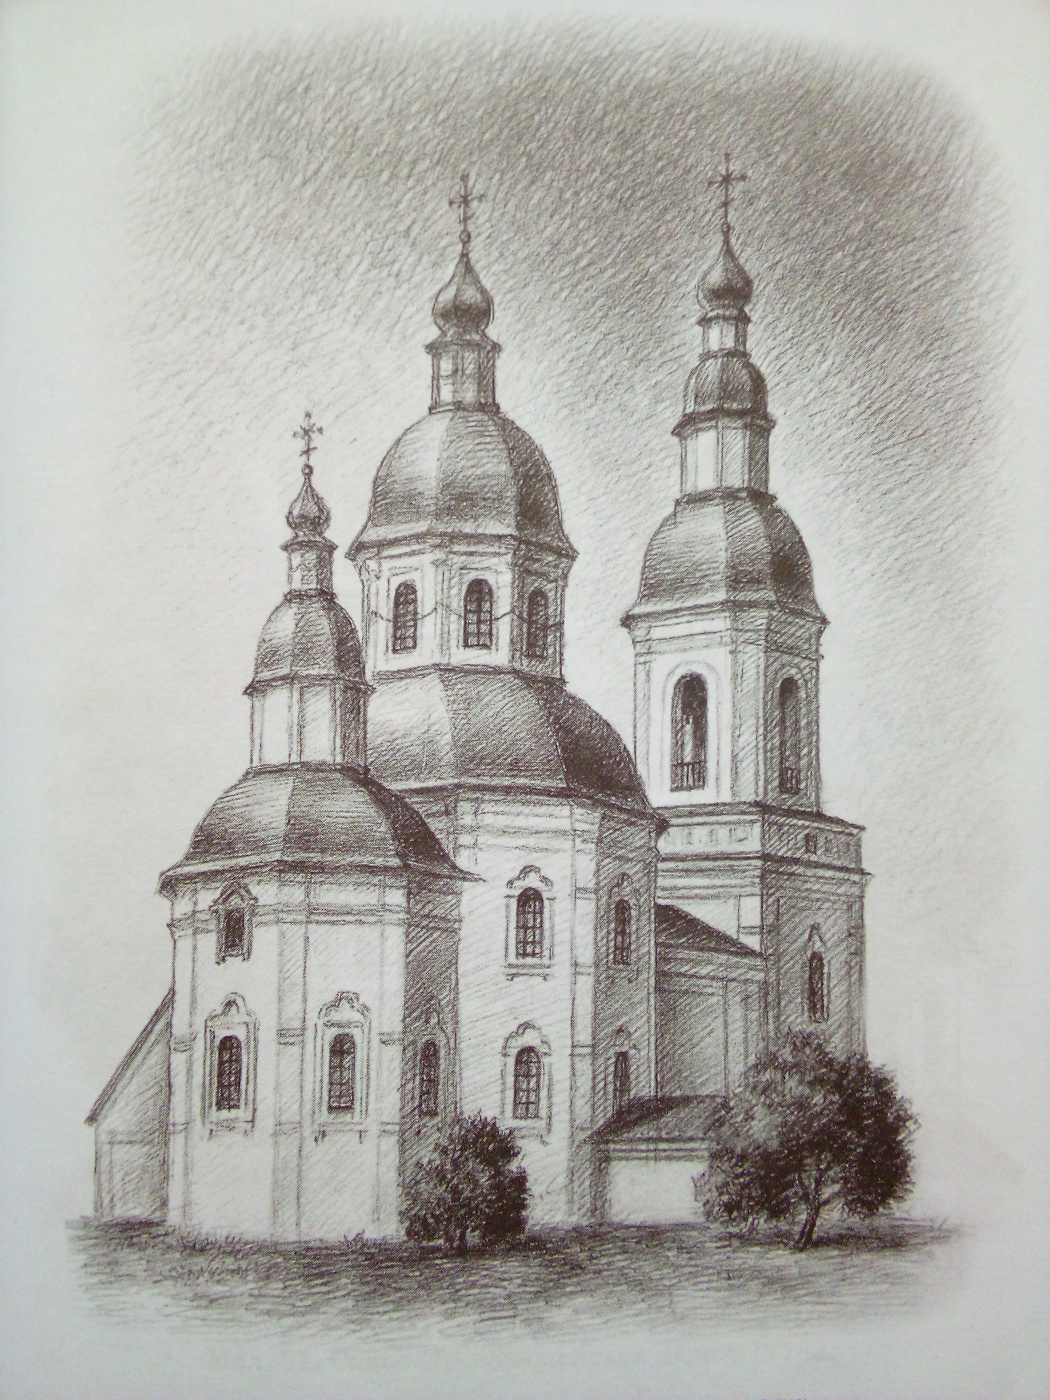 Ruslan Vasilievich Derevtsov. Church of St. Nicholas. (1683-1695)